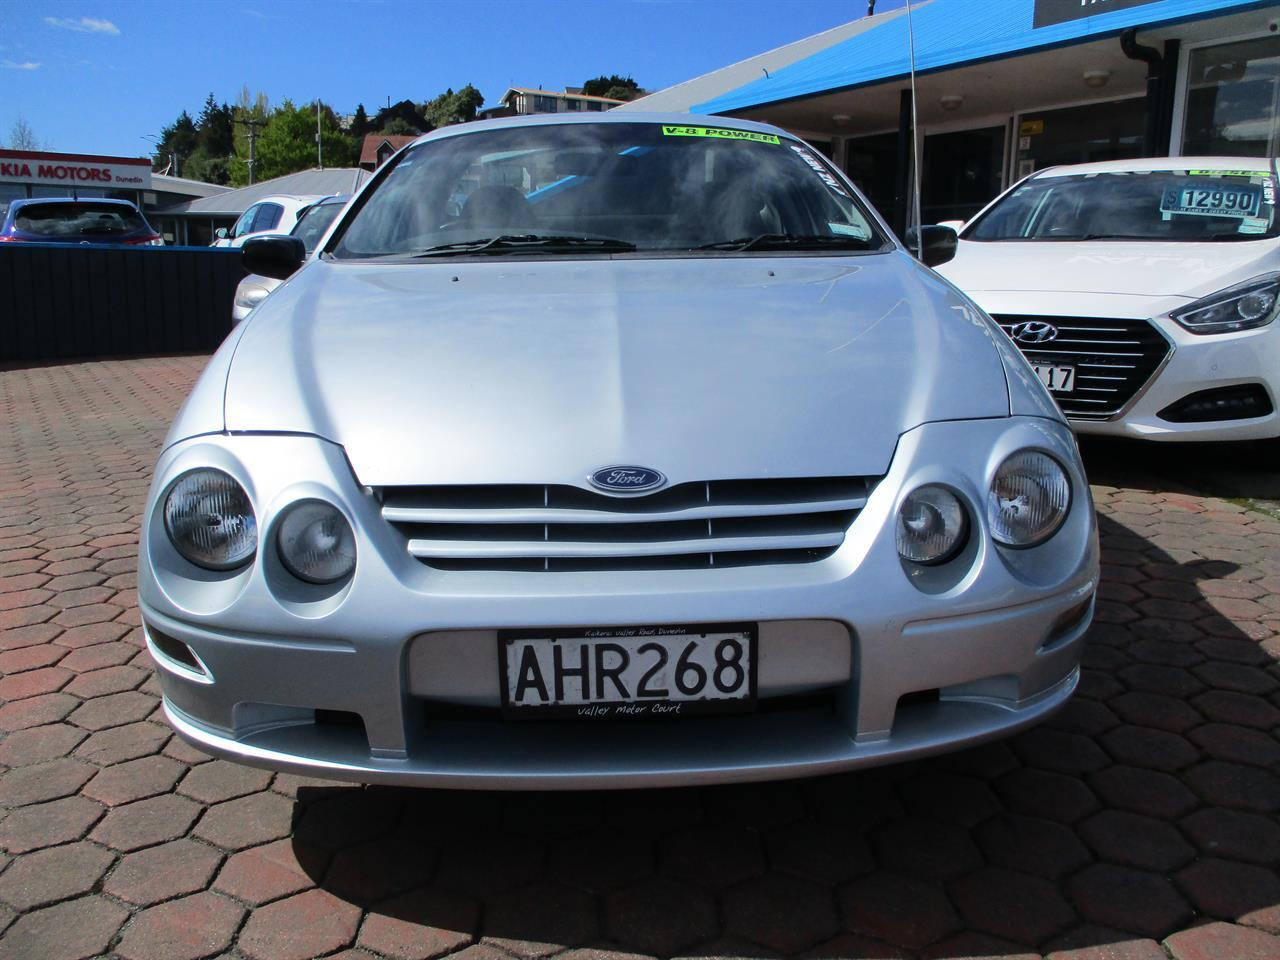 image-9, 2000 Ford Falcon AUII XR8 PICK UP FA at Dunedin